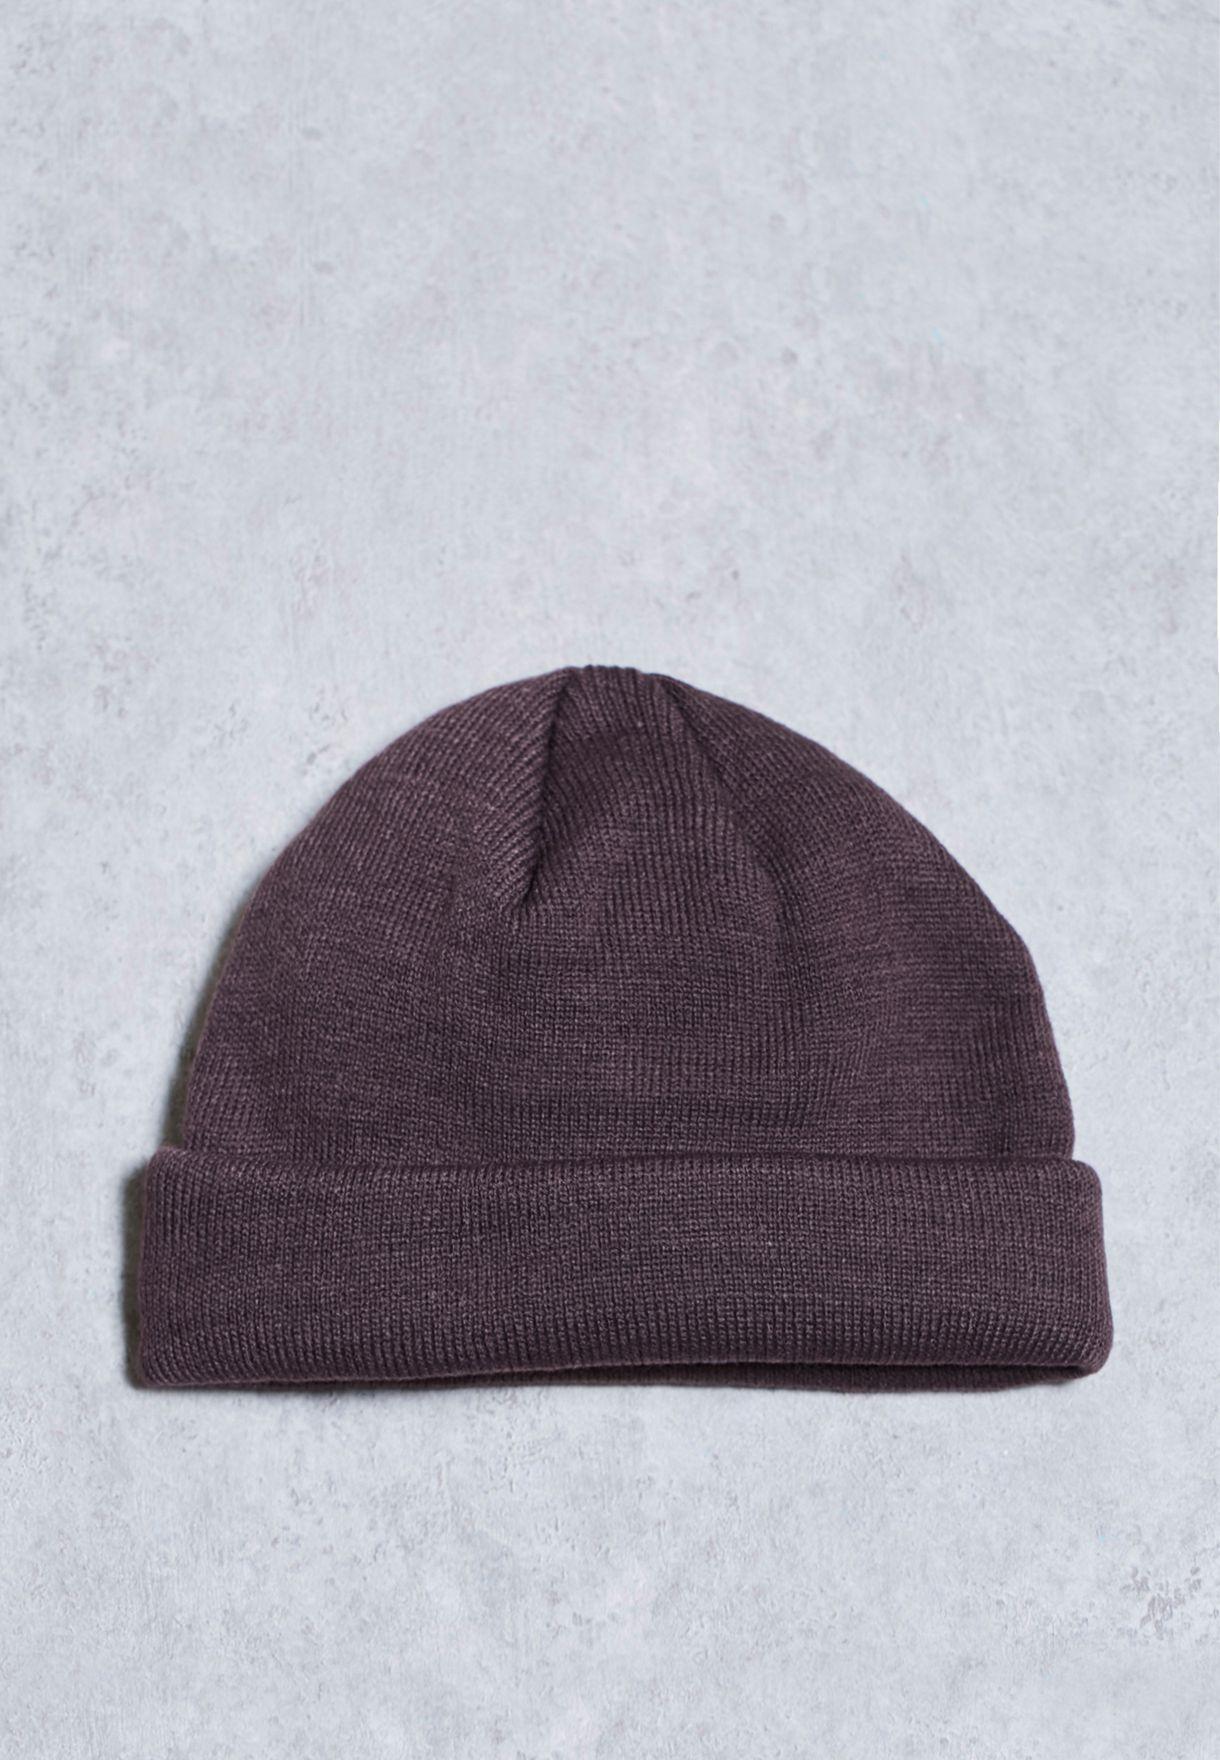 7eaba3c6808 Shop Topman burgundy Mini Fit Beanie Hat 56D55NBRG for Men in UAE -  TO857AC94ZKJ